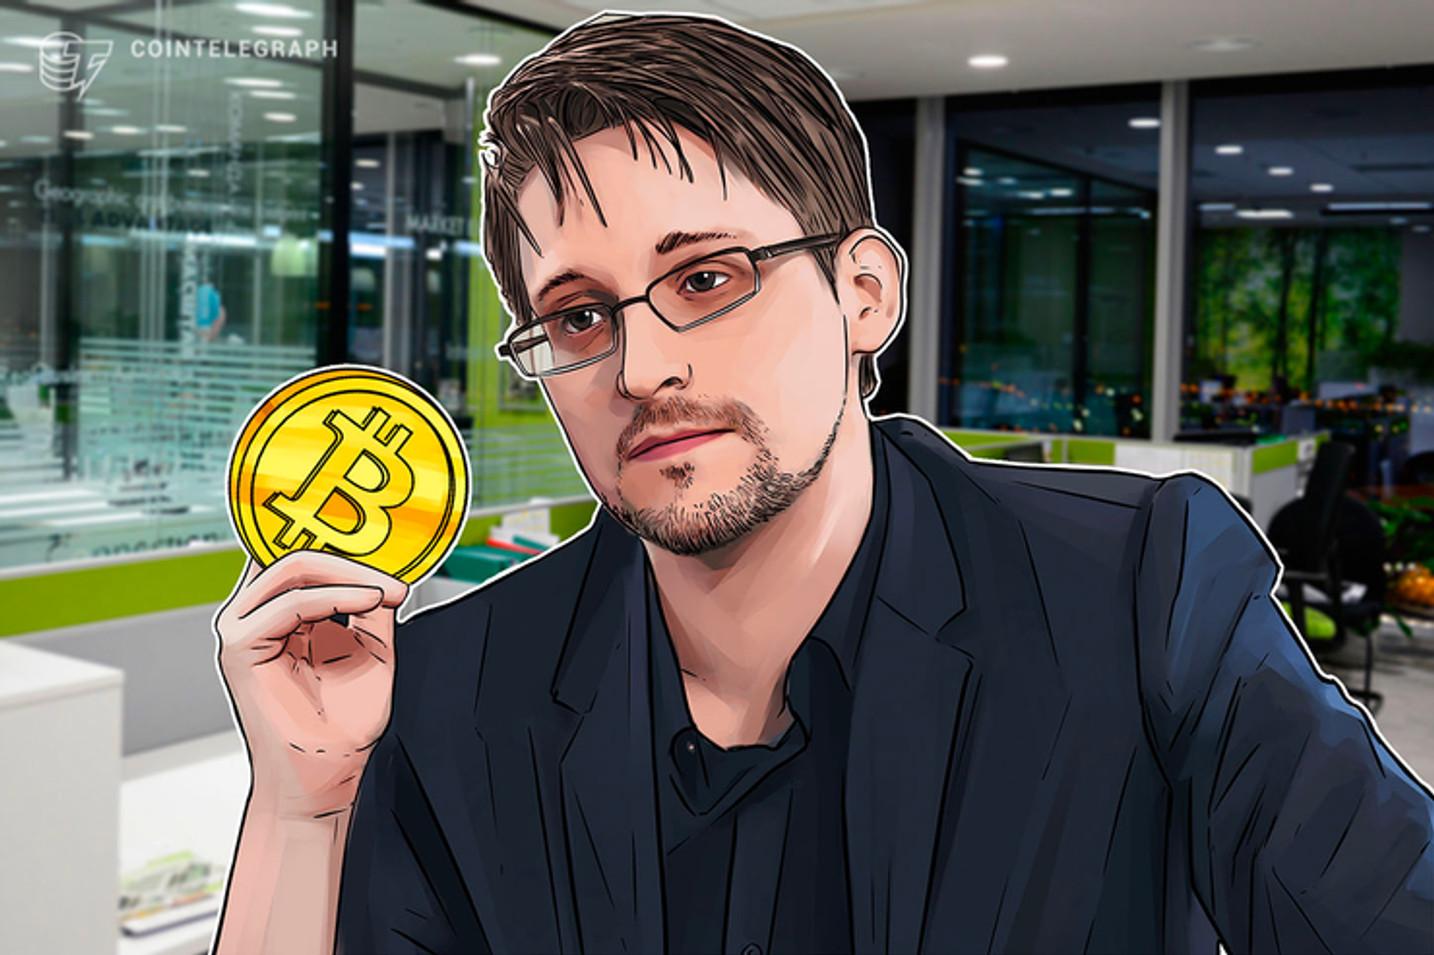 Em evento sobre criptomoedas, Edward Snowden diz que 'privacidade do Bitcoin é fraca'